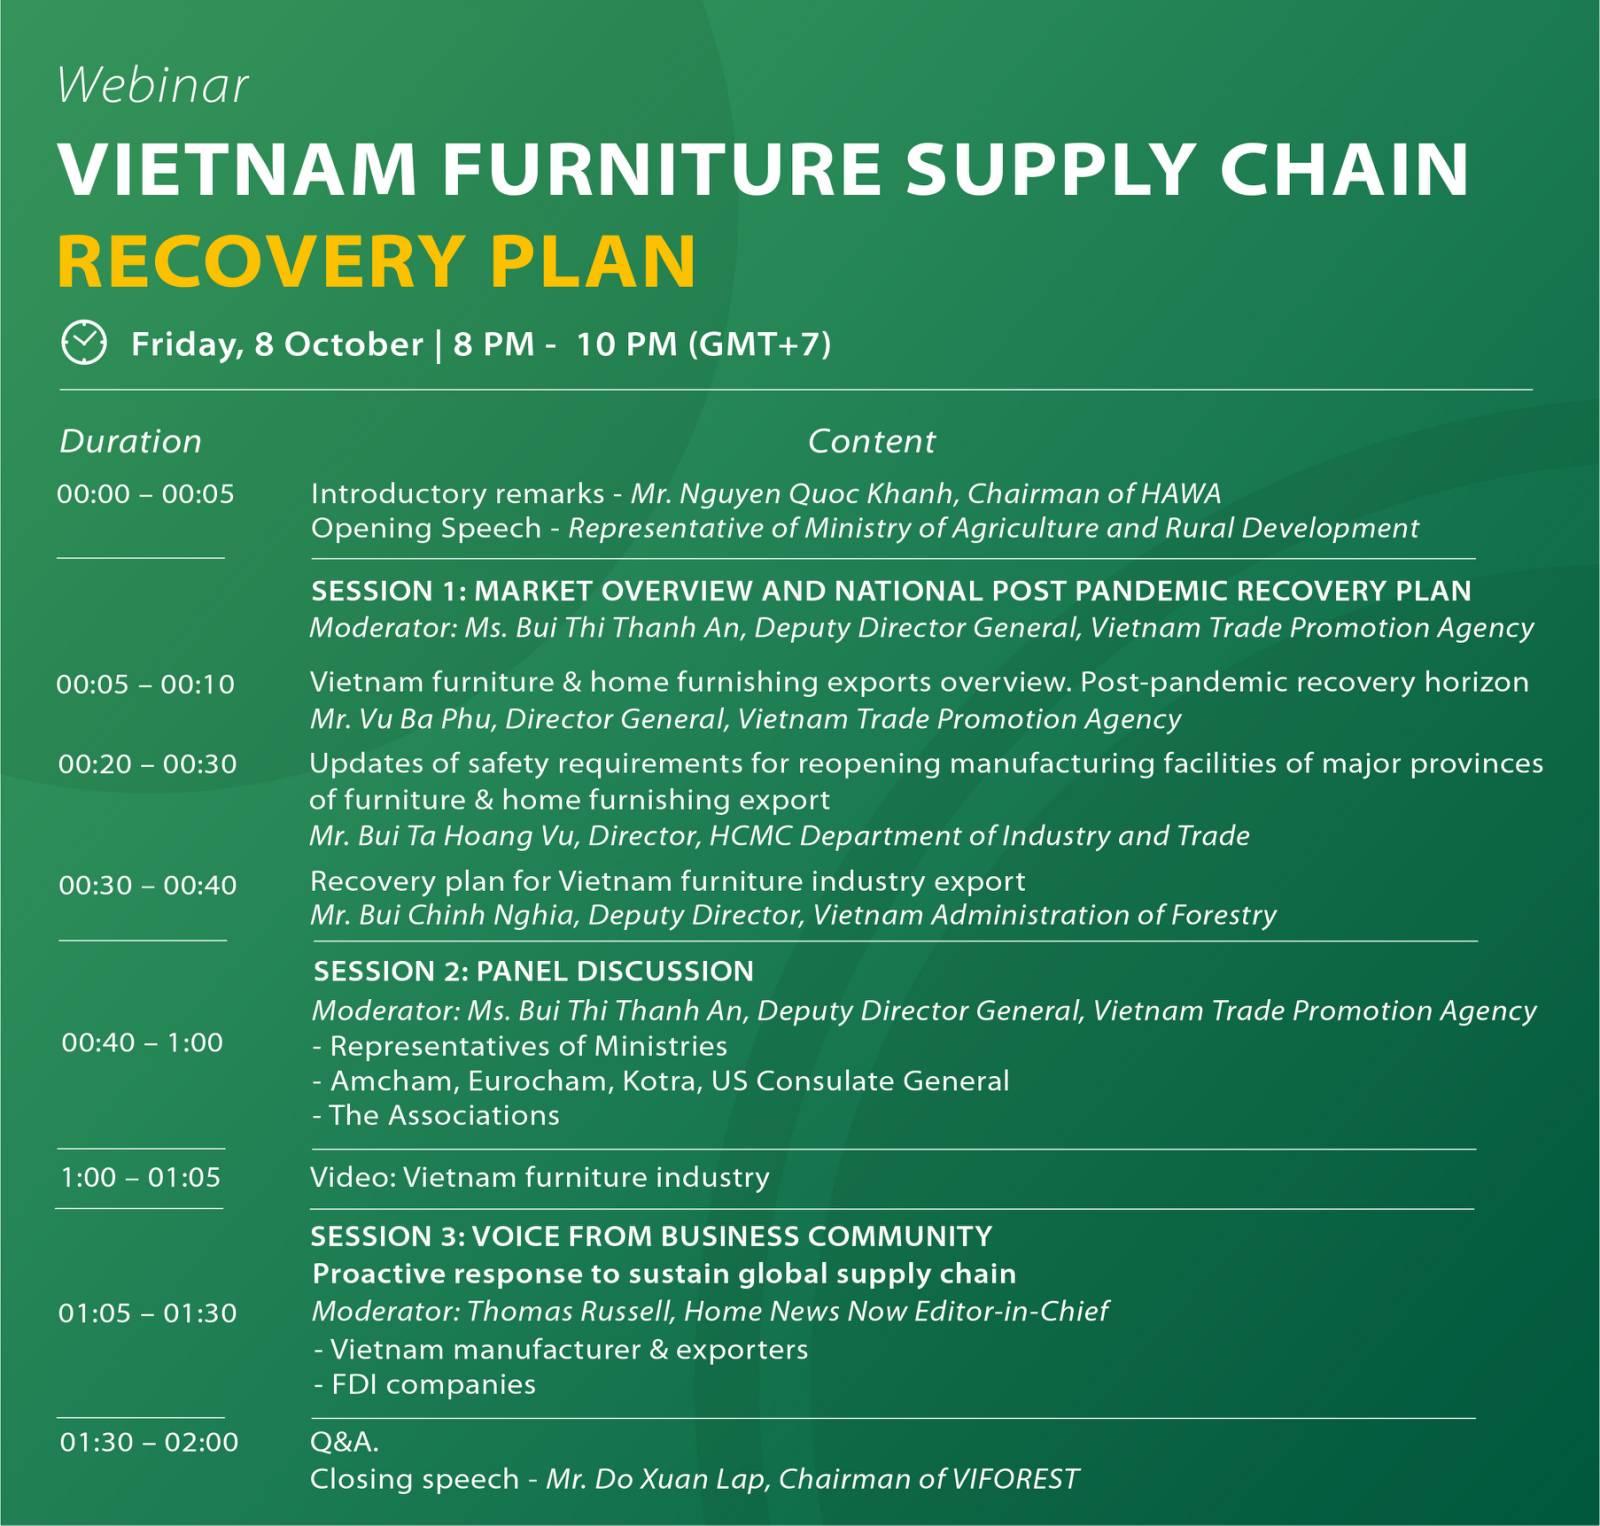 Vietnam furniture supply chain recovery plan_Agenda